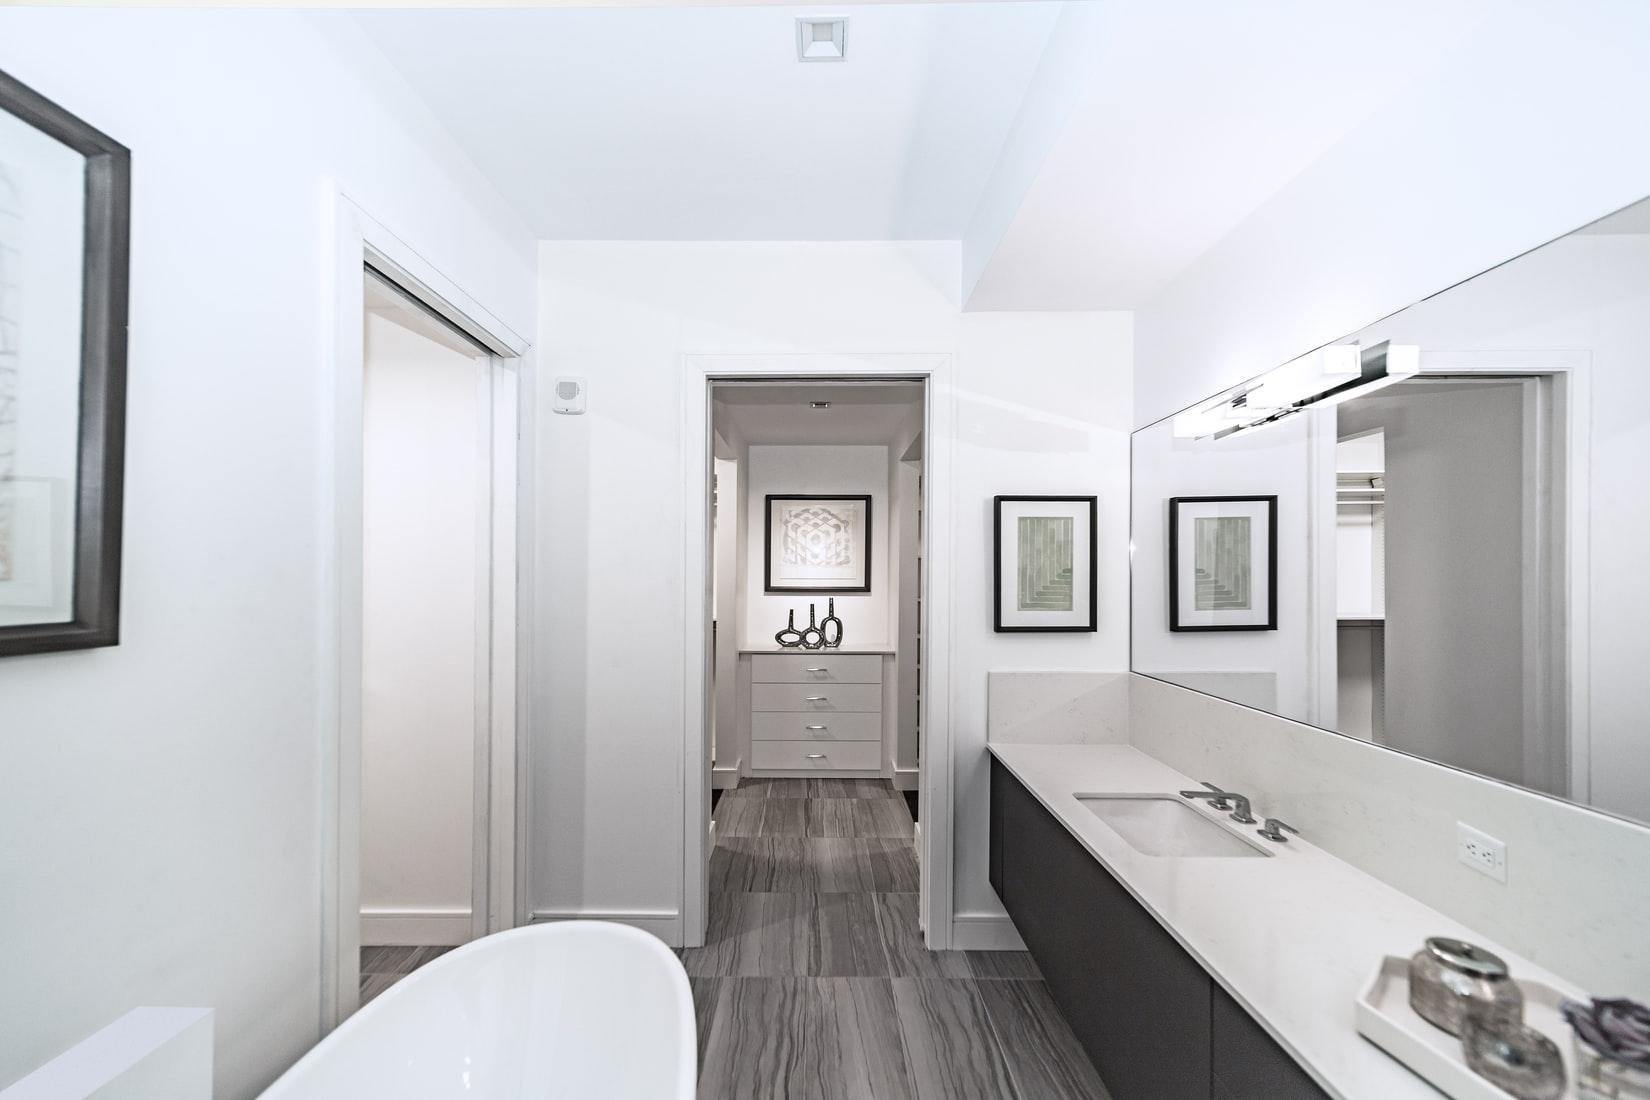 Non-slip vinyl bathroom flooring